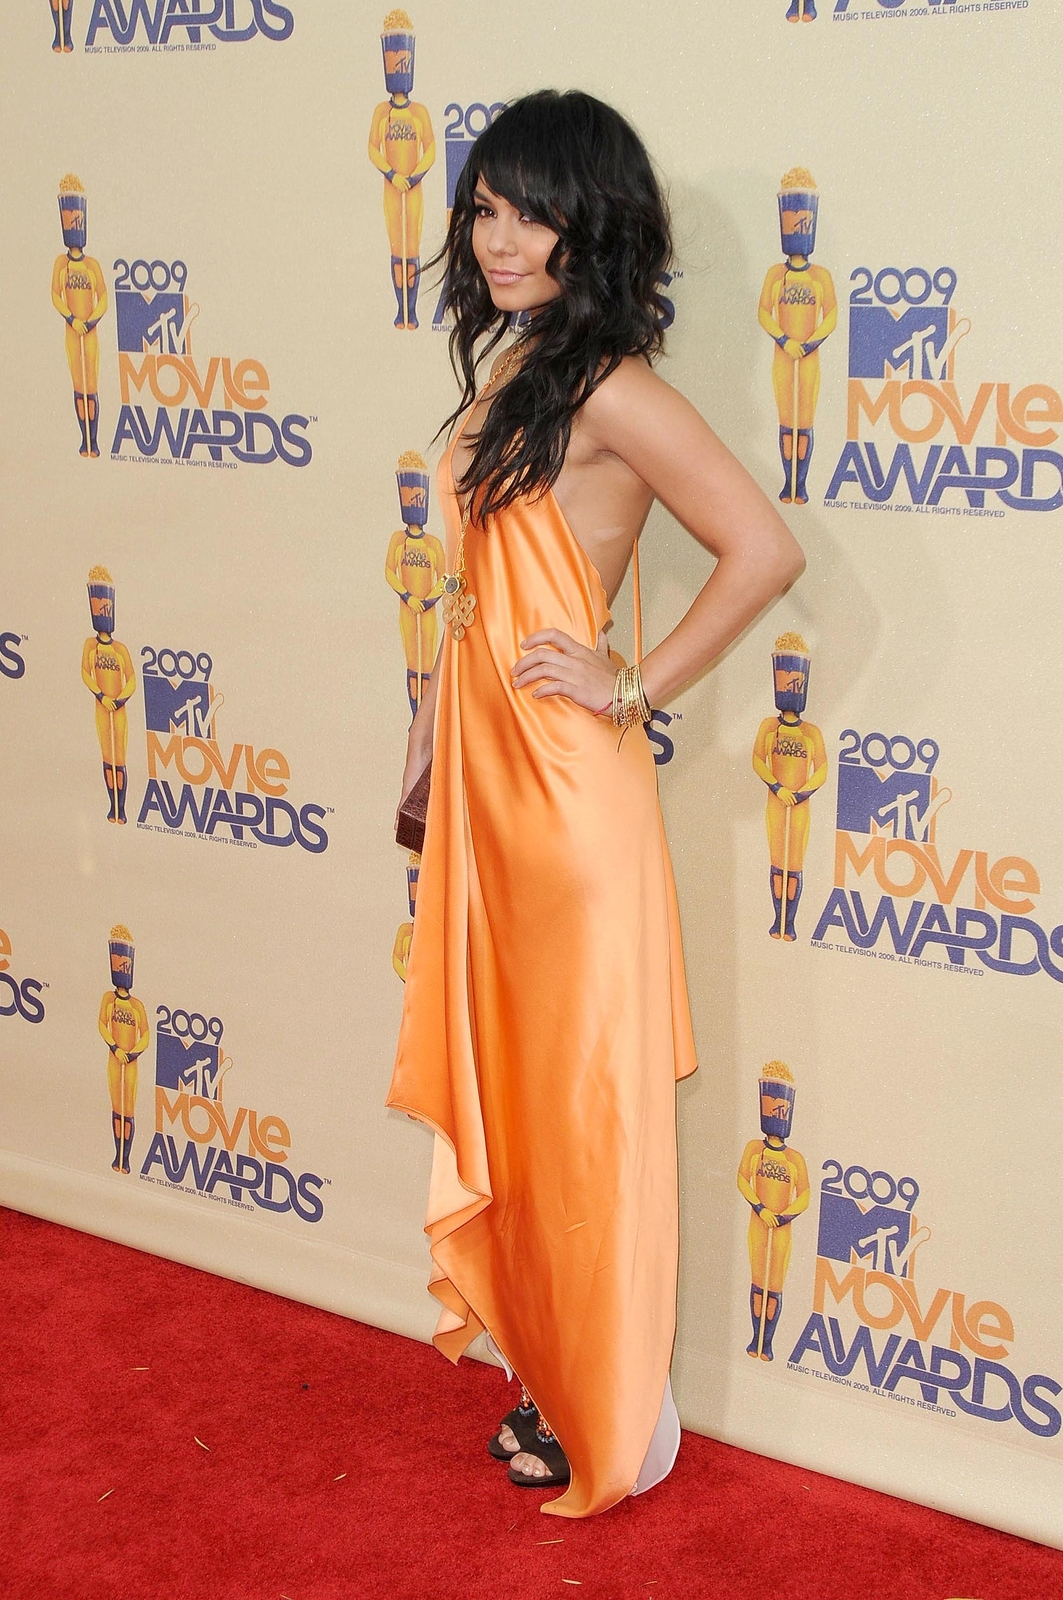 Vanessa Hudgens at the 2009 MTV Movie Awards, 2009, right before filming Photo: S Buckley / Shutterstock